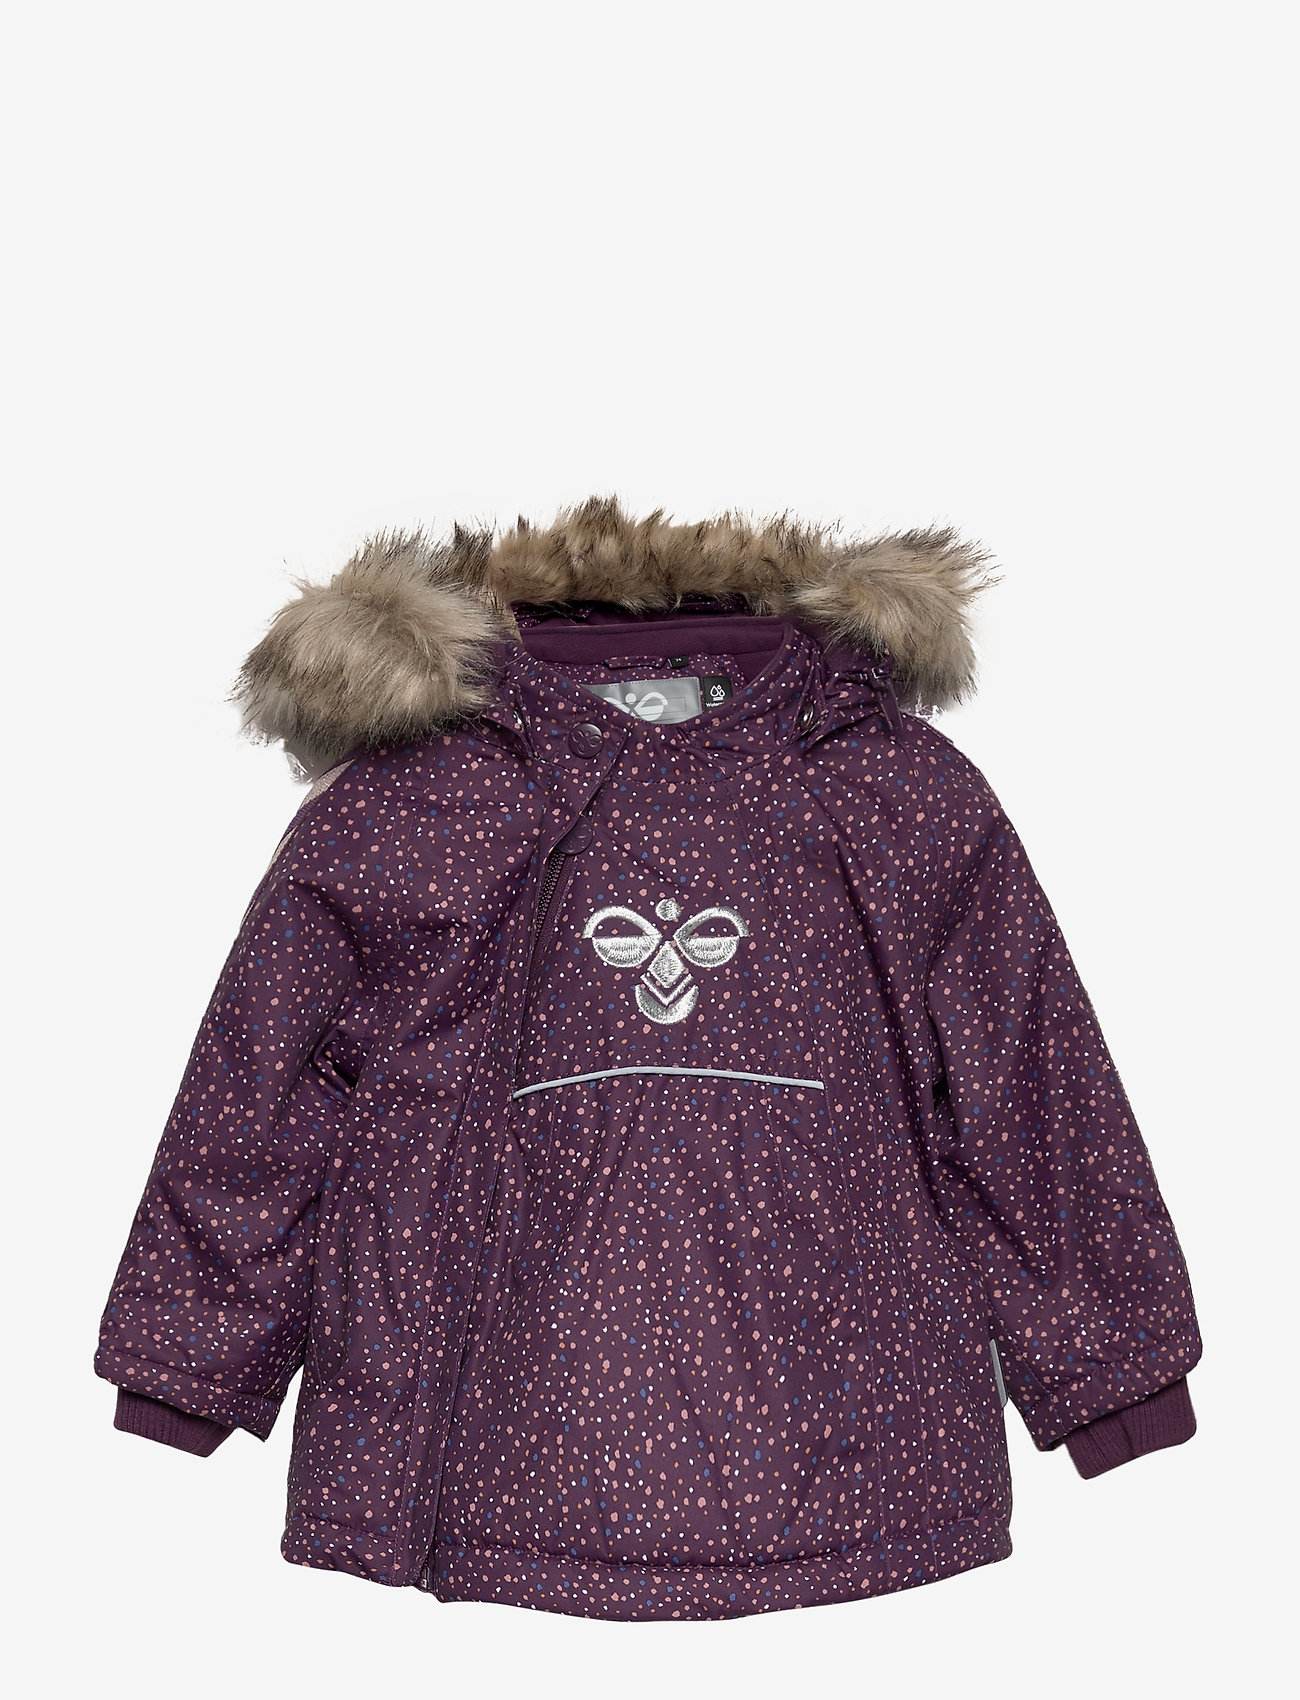 Hummel - hmlJESSIE JACKET - insulated jackets - blackberry wine - 0